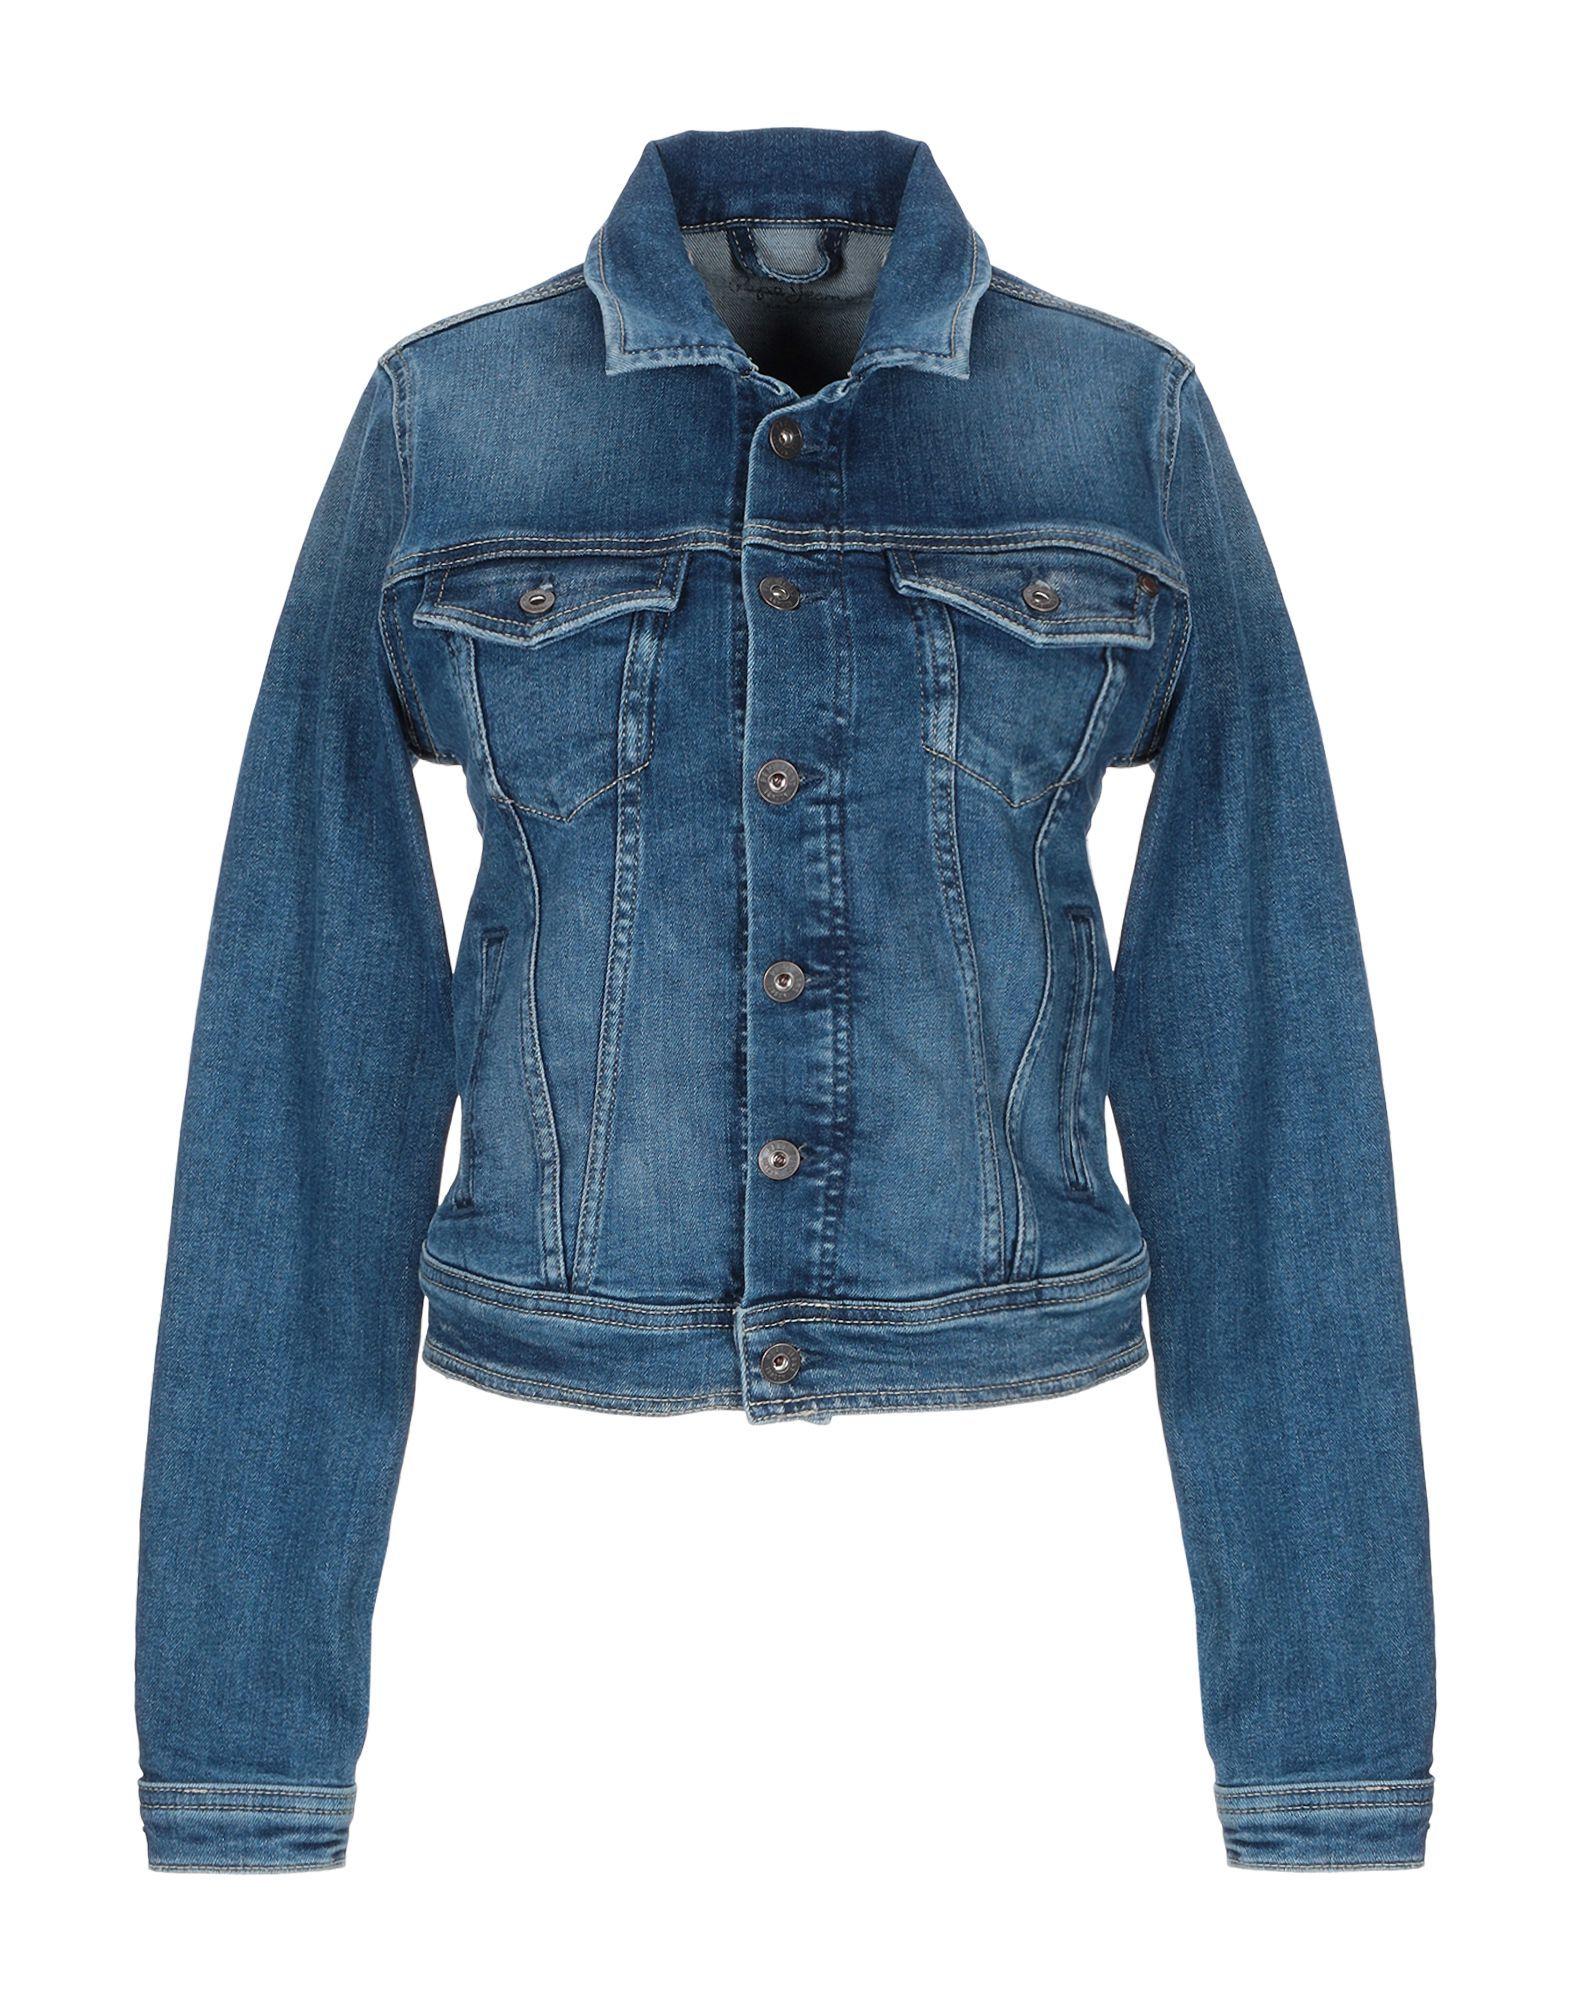 DENIM Woman Pepe Jeans Blue Cotton